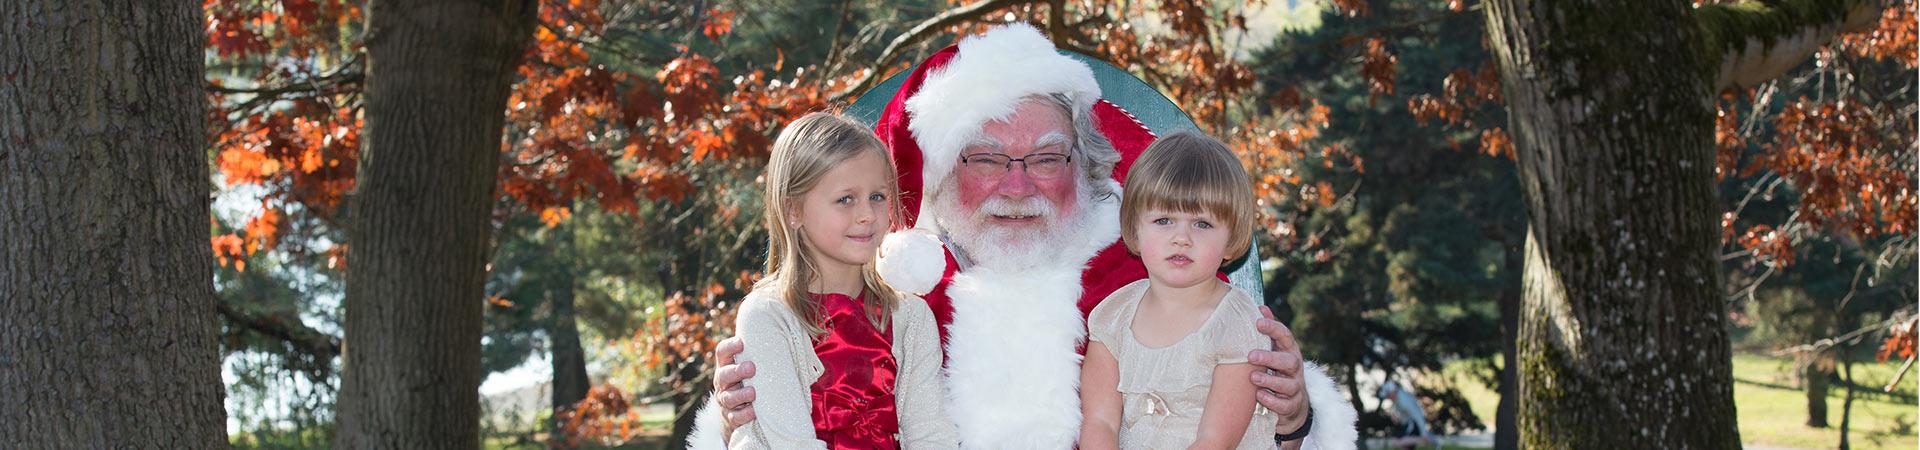 Santa-HP-Banner-Watkinson-girls.jpg